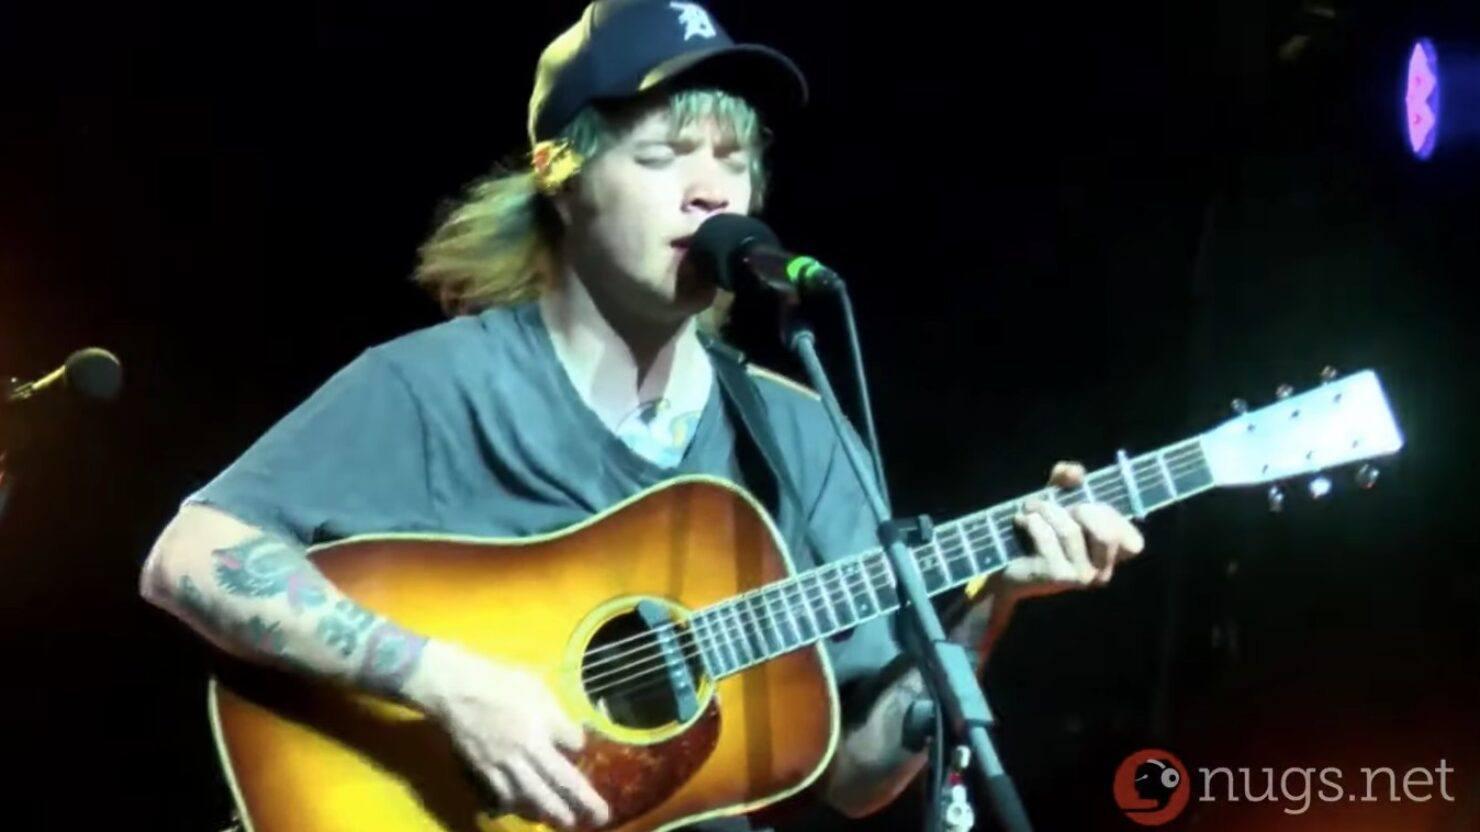 Billy Strings Covers Grateful Dead's 'Alabama Getaway' In Mobile